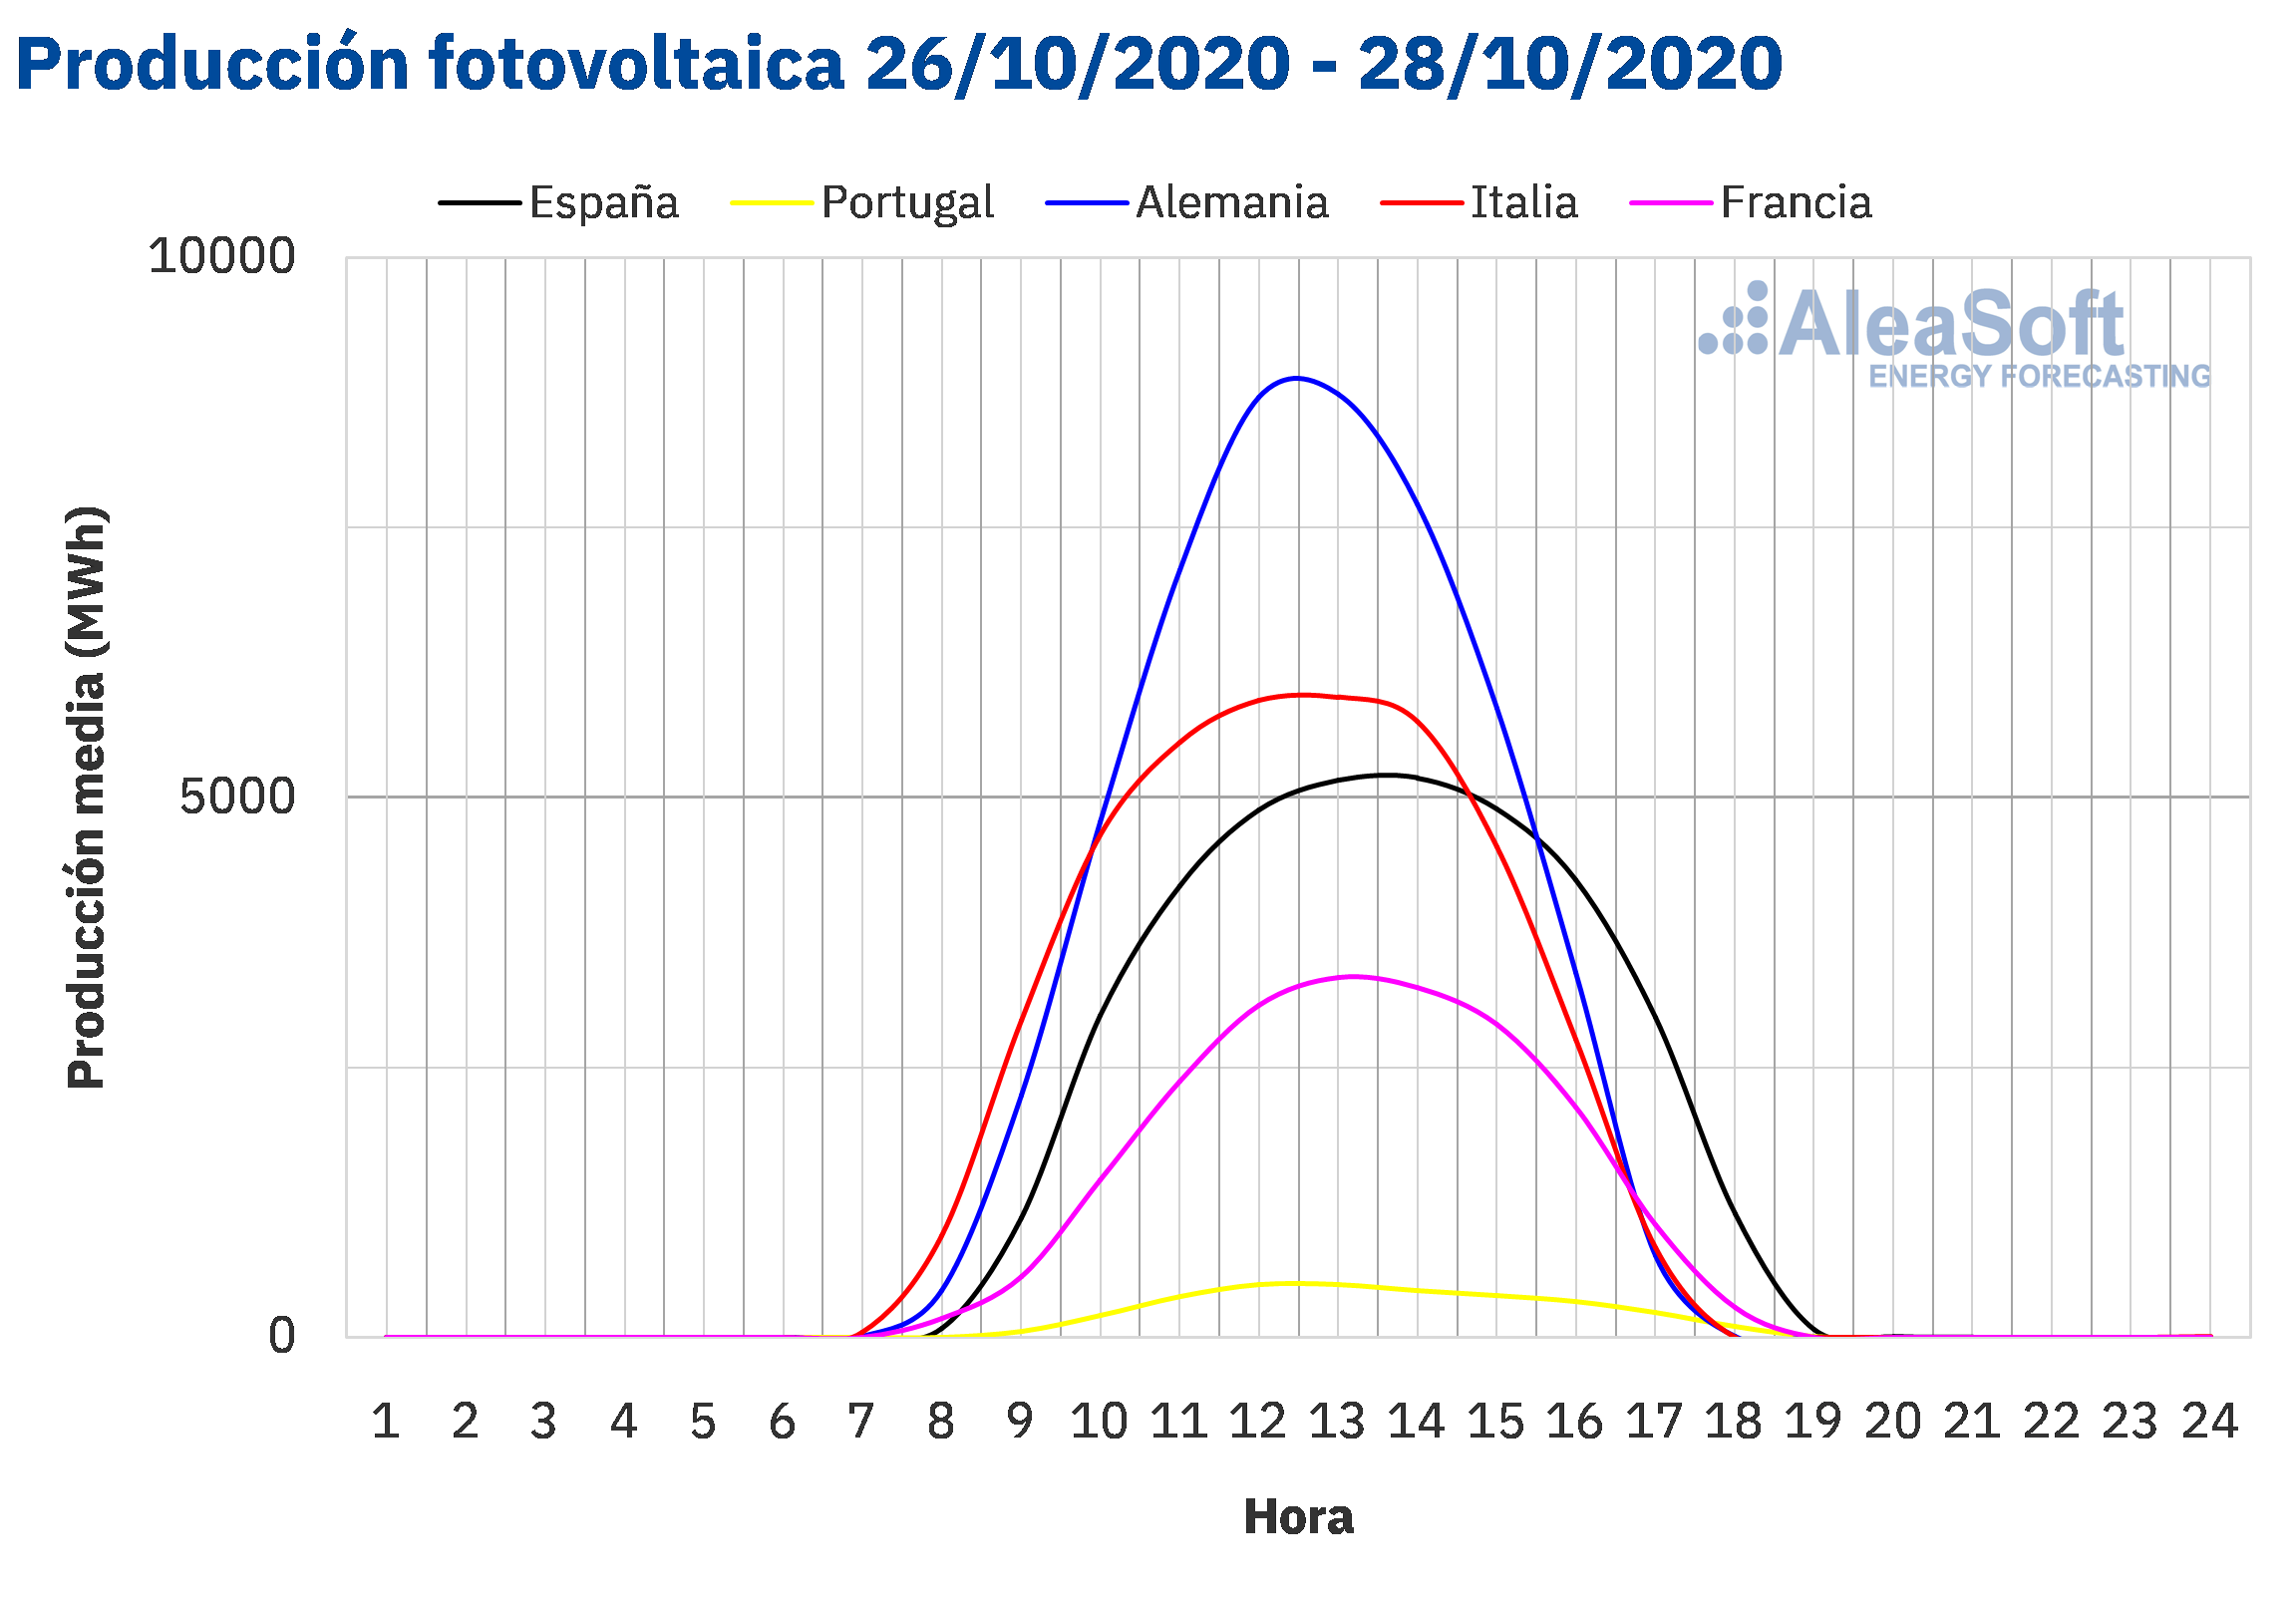 AleaSoft - Perfil de producción solar fotovoltaica de Europa